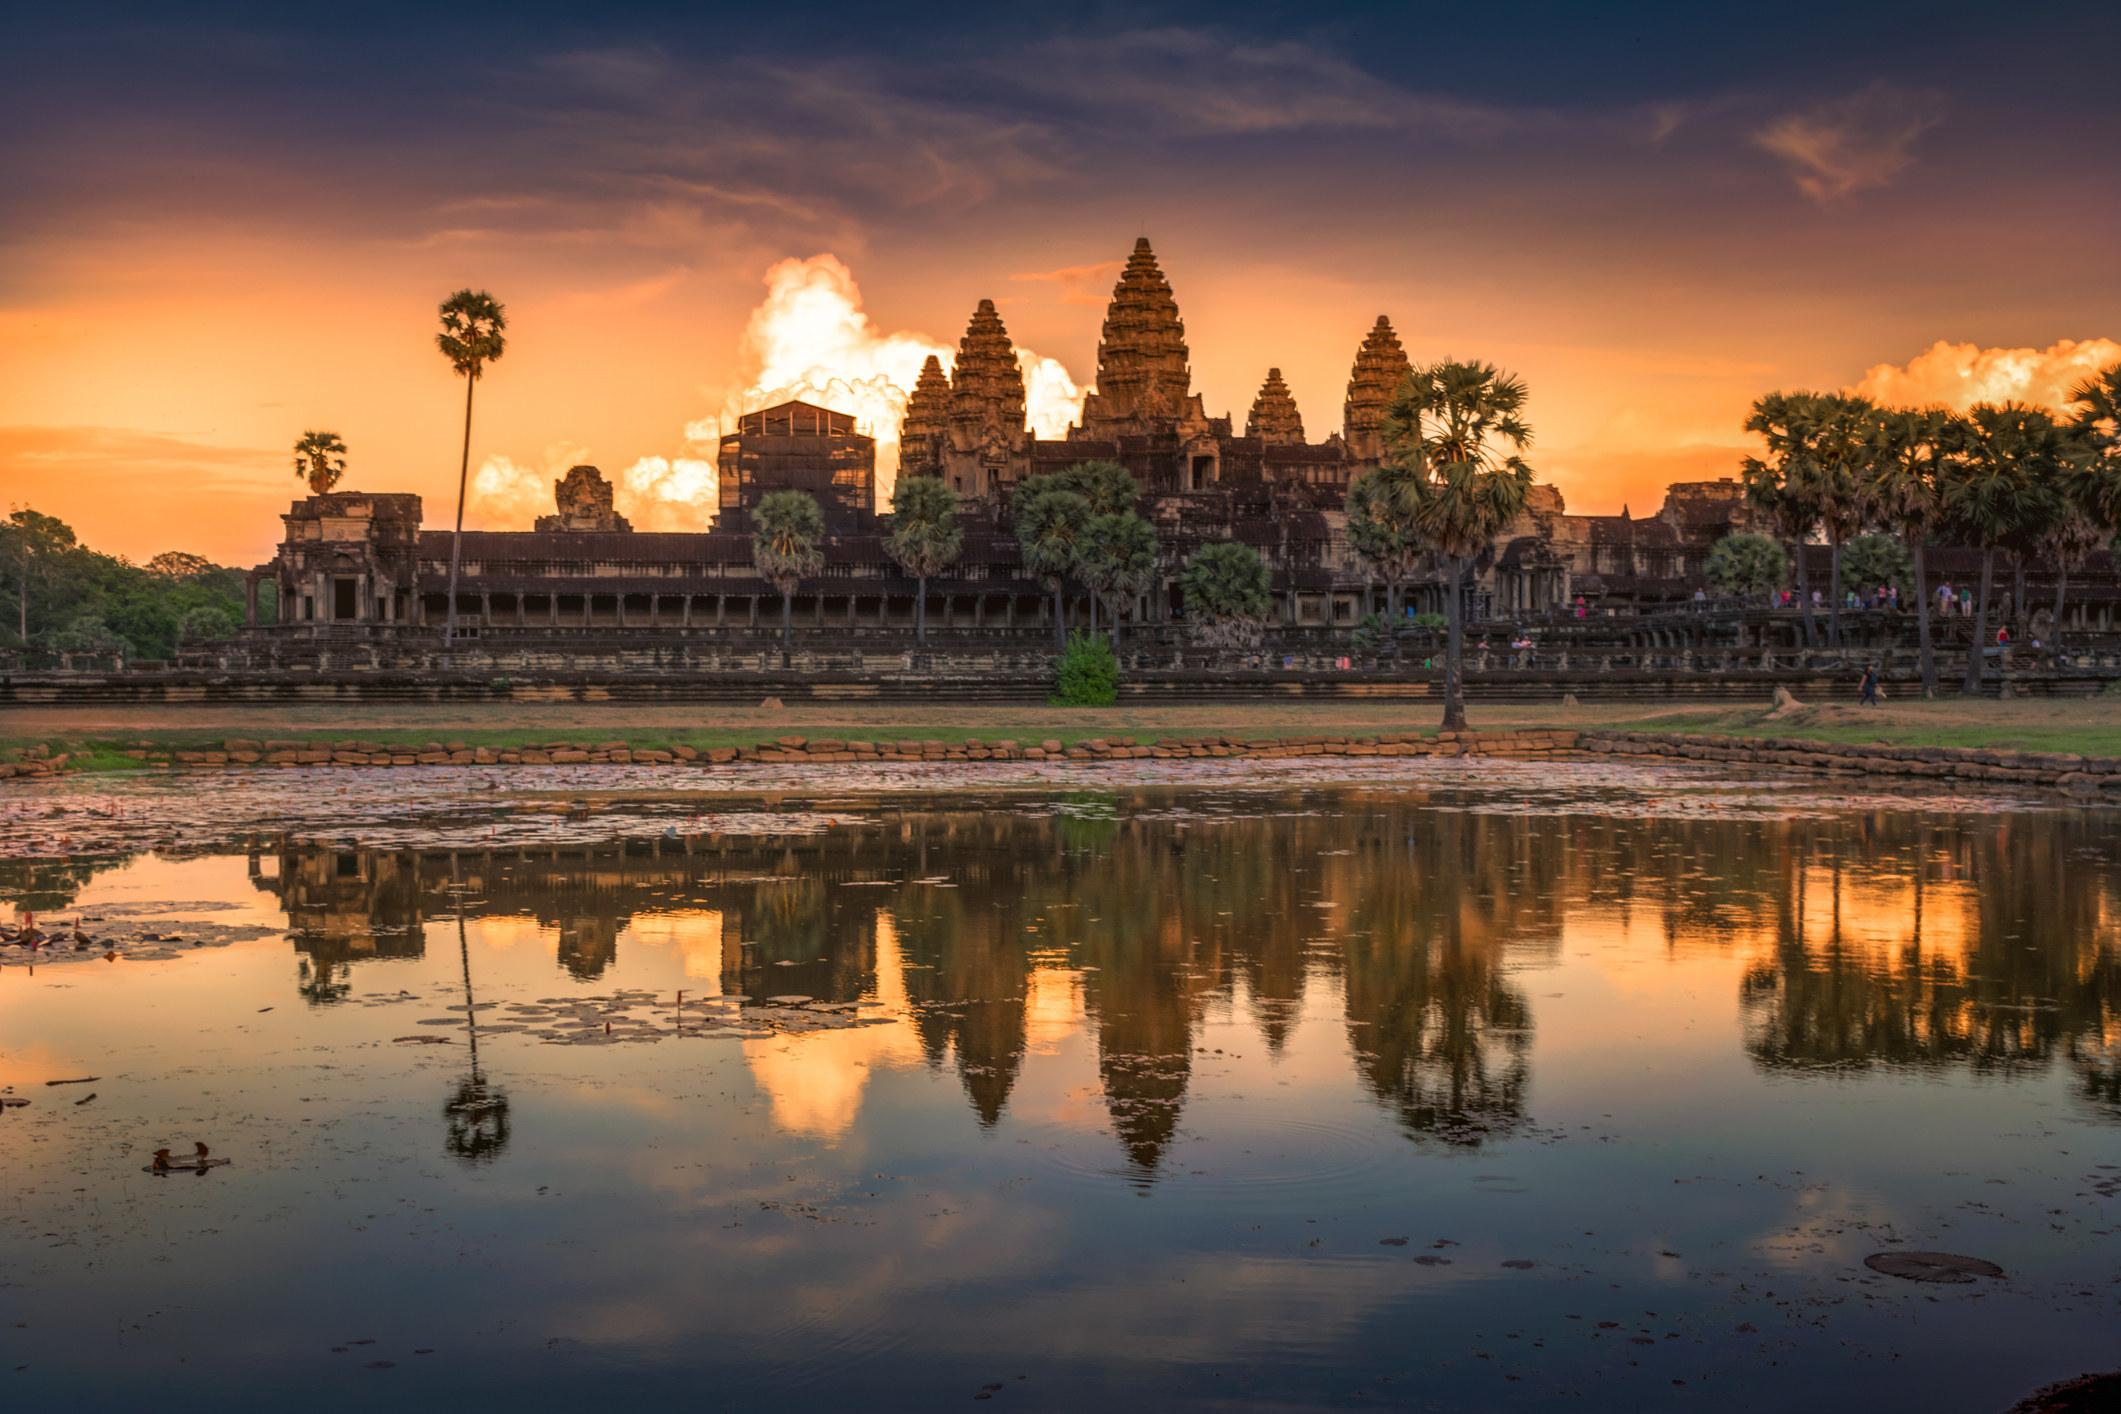 Sunset over Angor Wat.